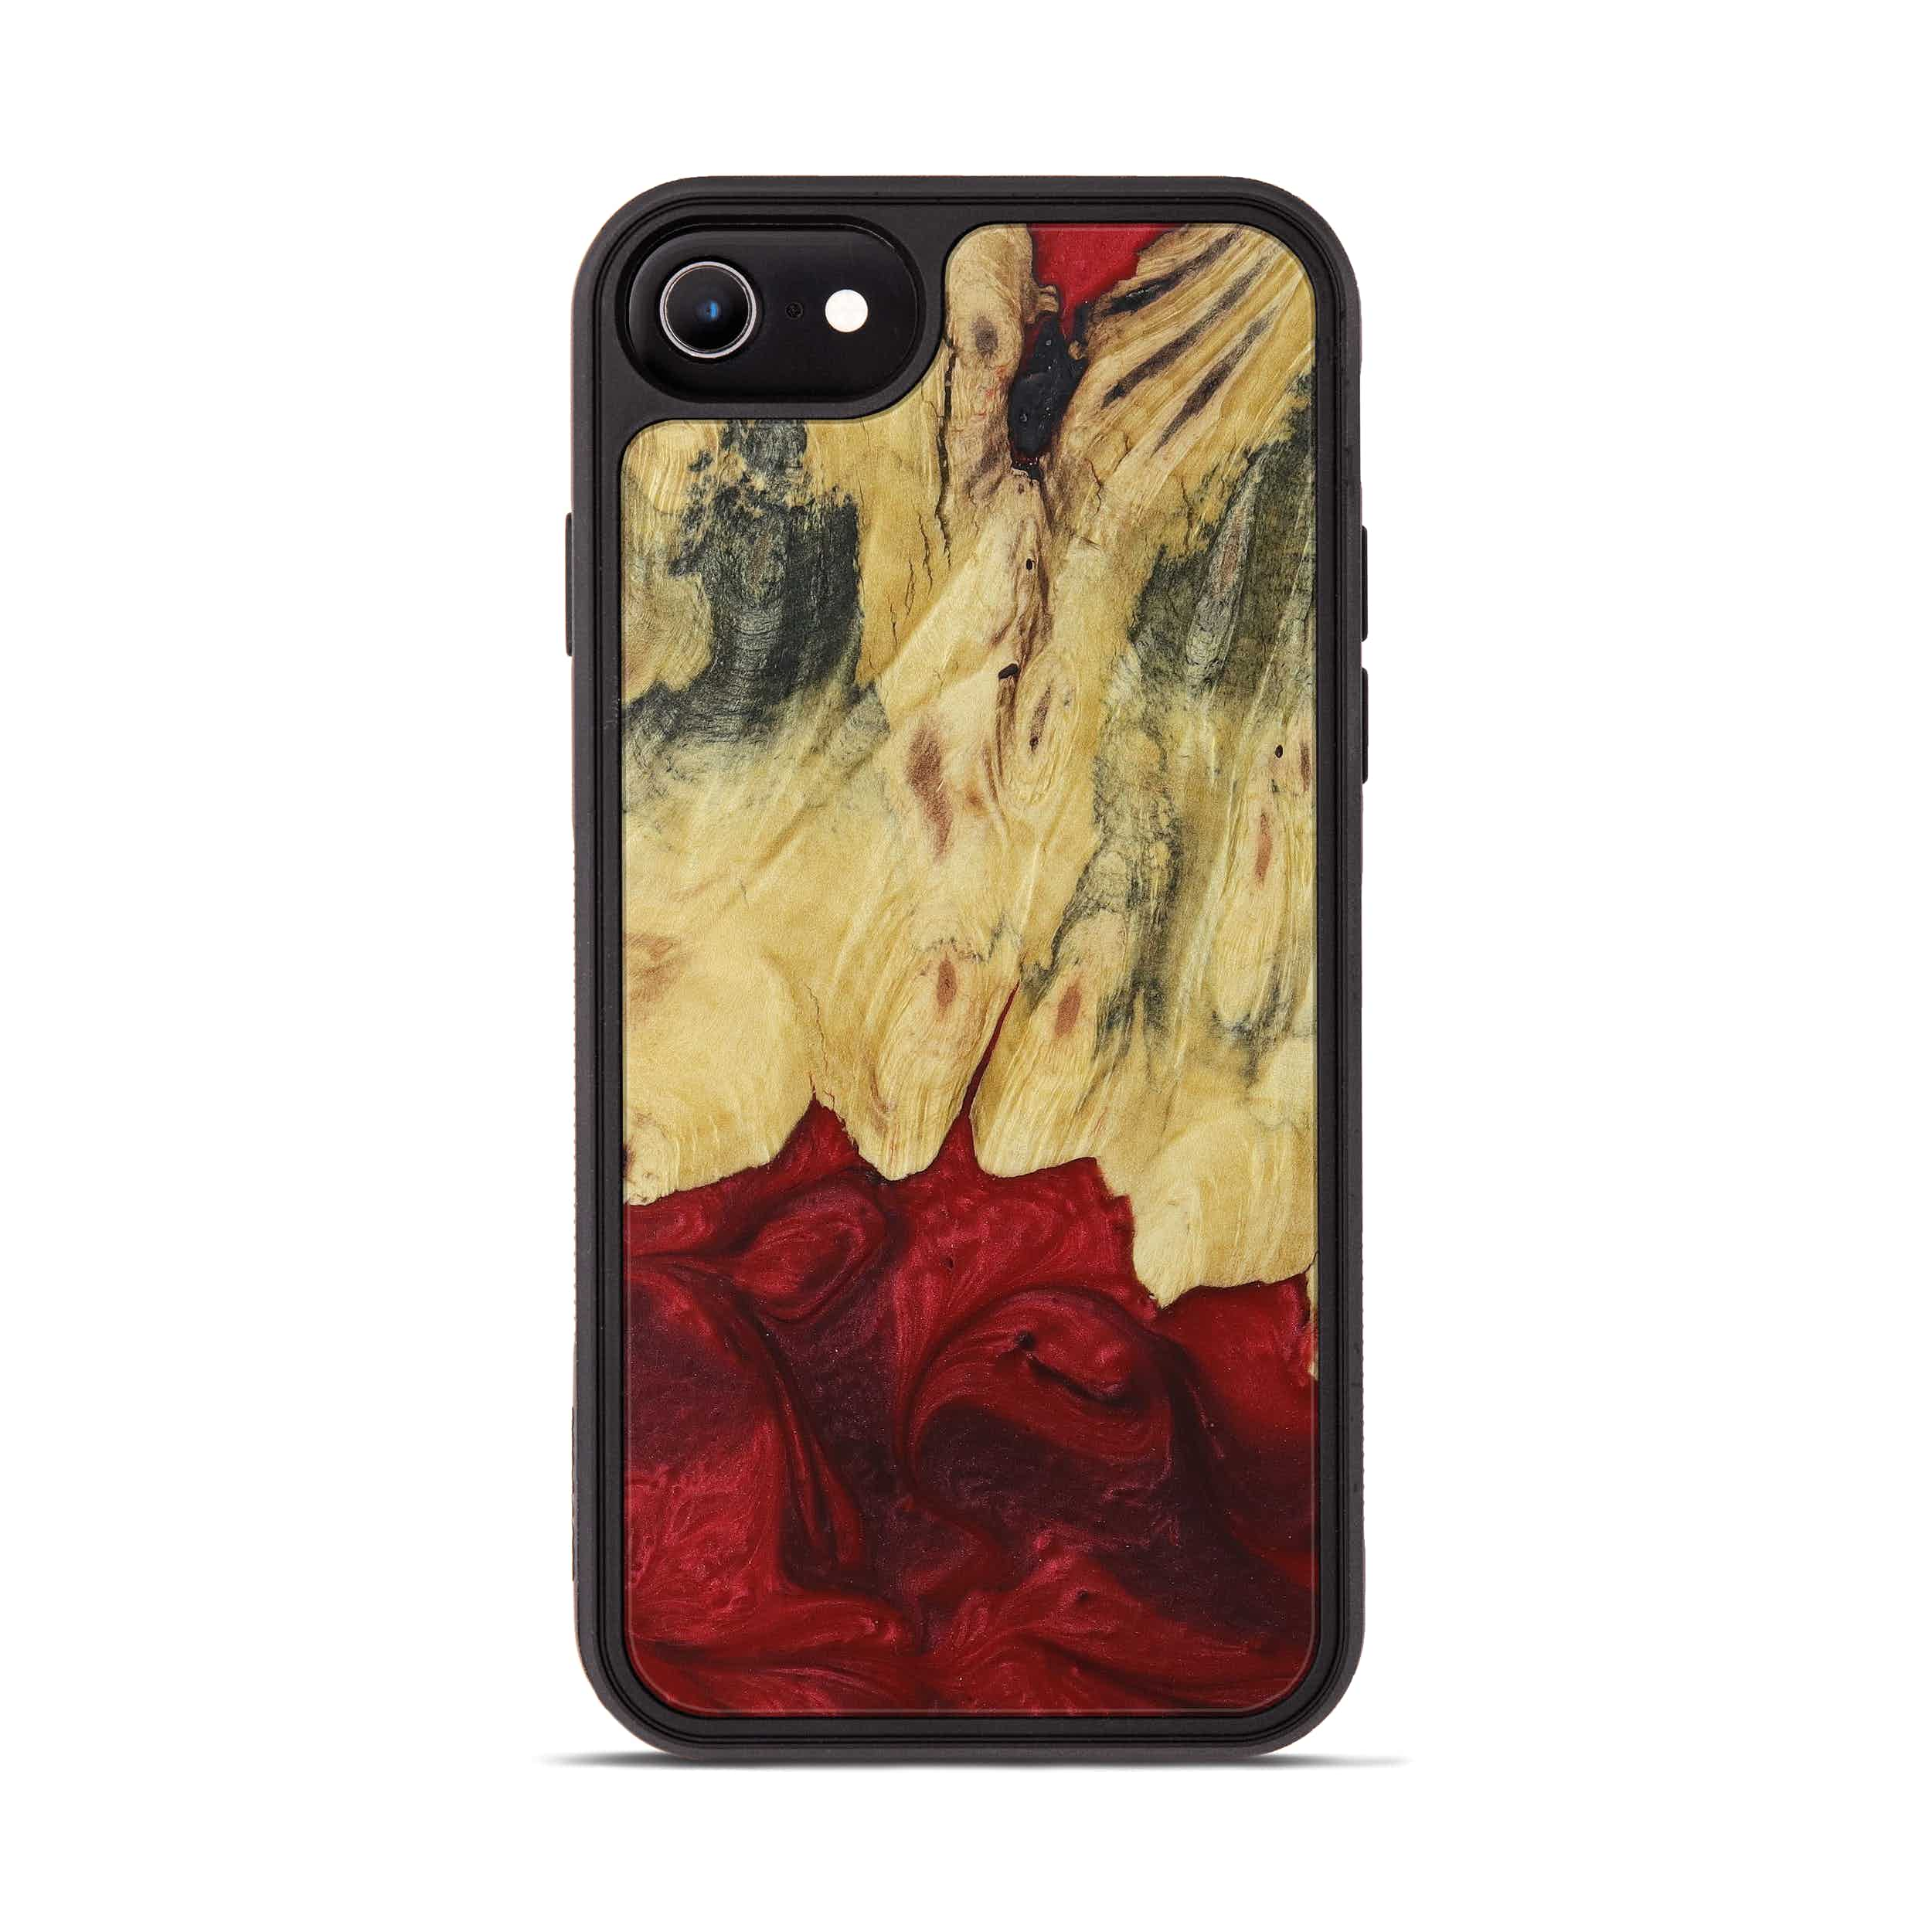 iPhone 6s Wood+Resin Phone Case - Sidoney (Dark Red, 395932)